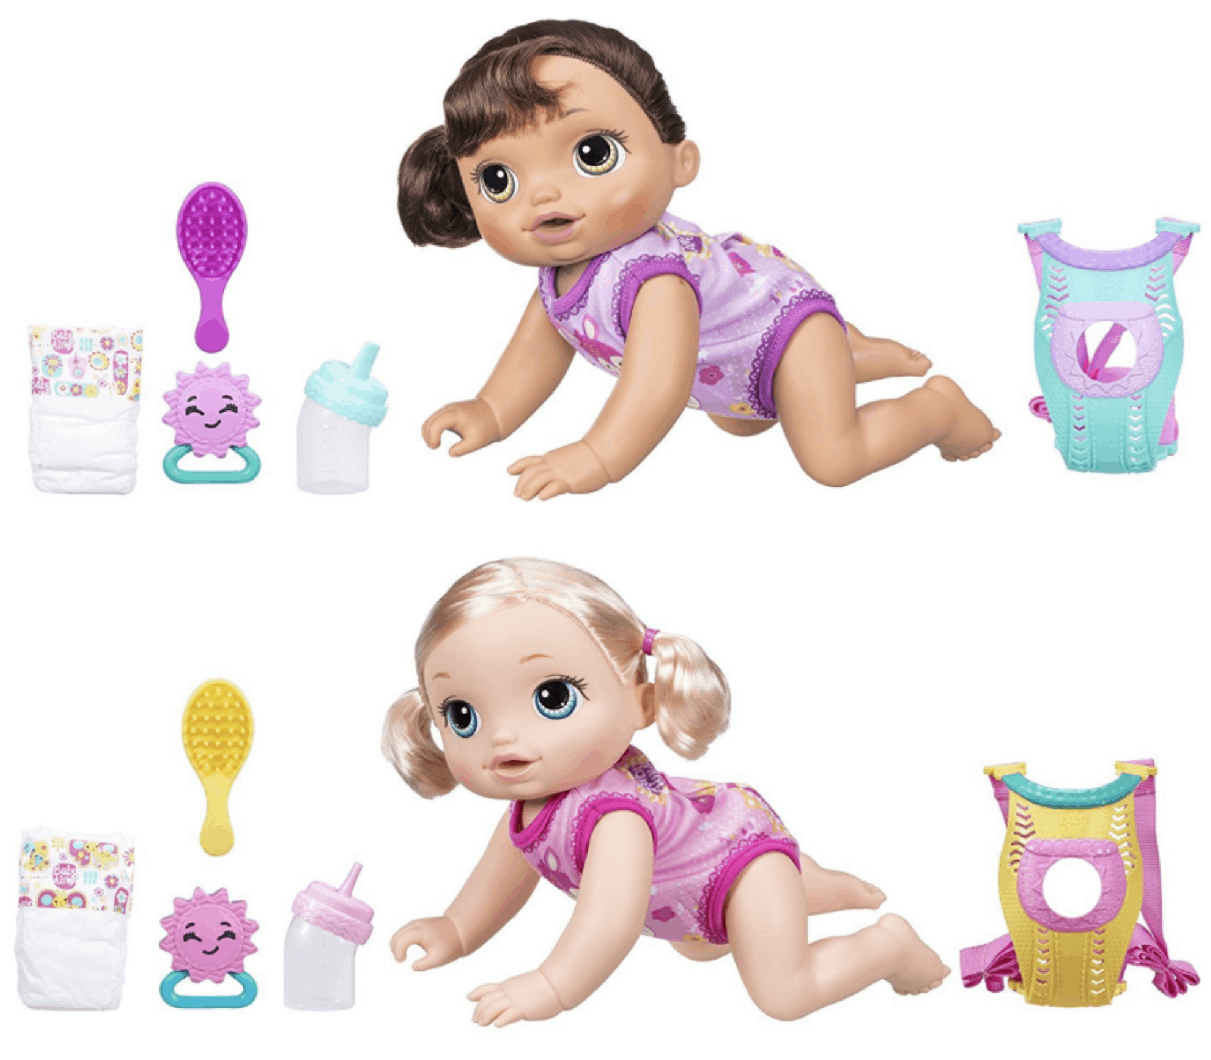 картинки кукол беби лайф расположение